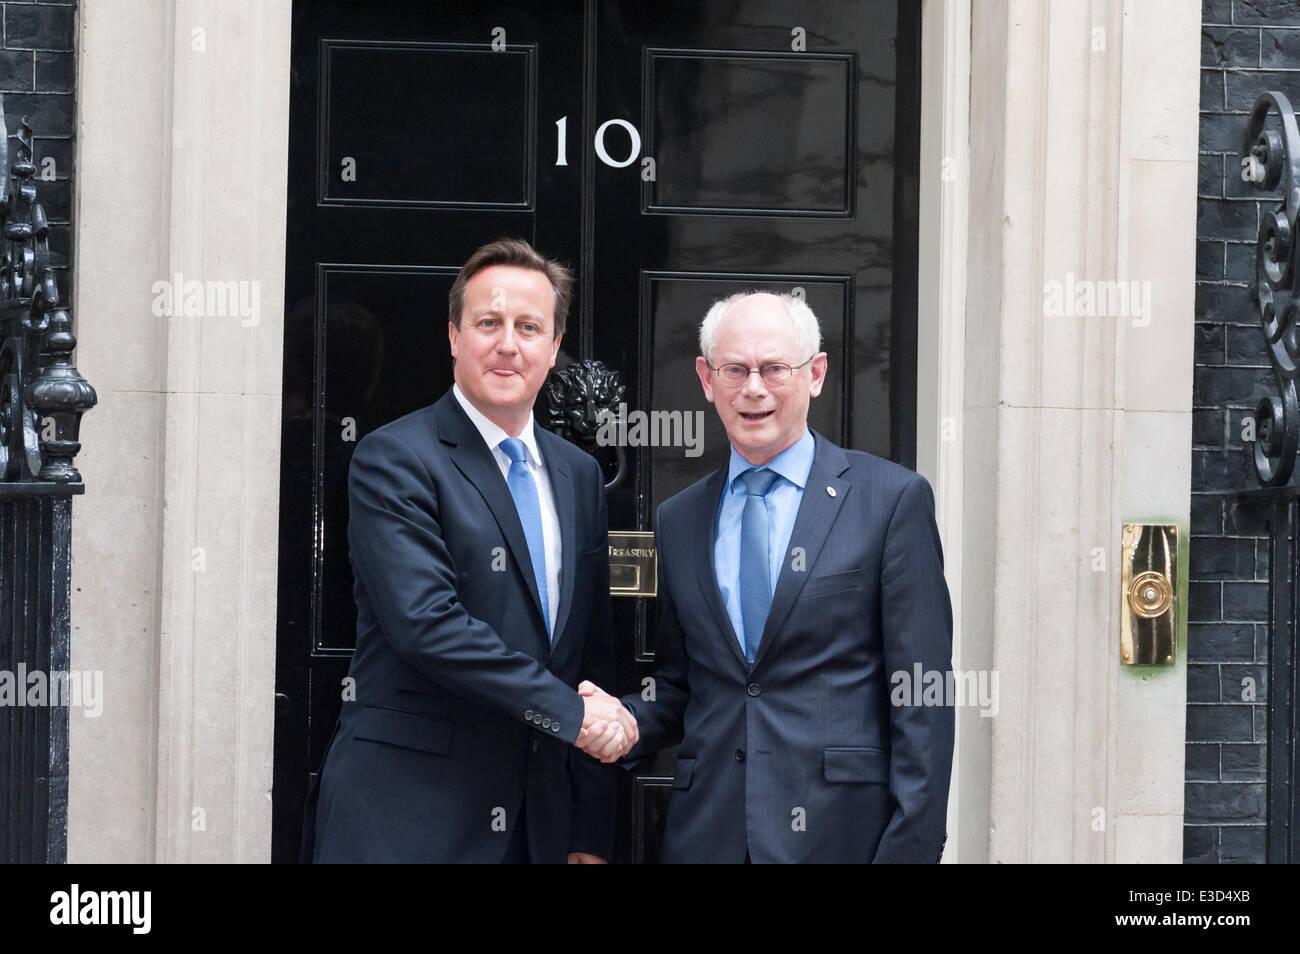 Downing Street, London, UK. 23rd June 2014. Herman Van Rompuy, the president of the European Council, meets David Stock Photo